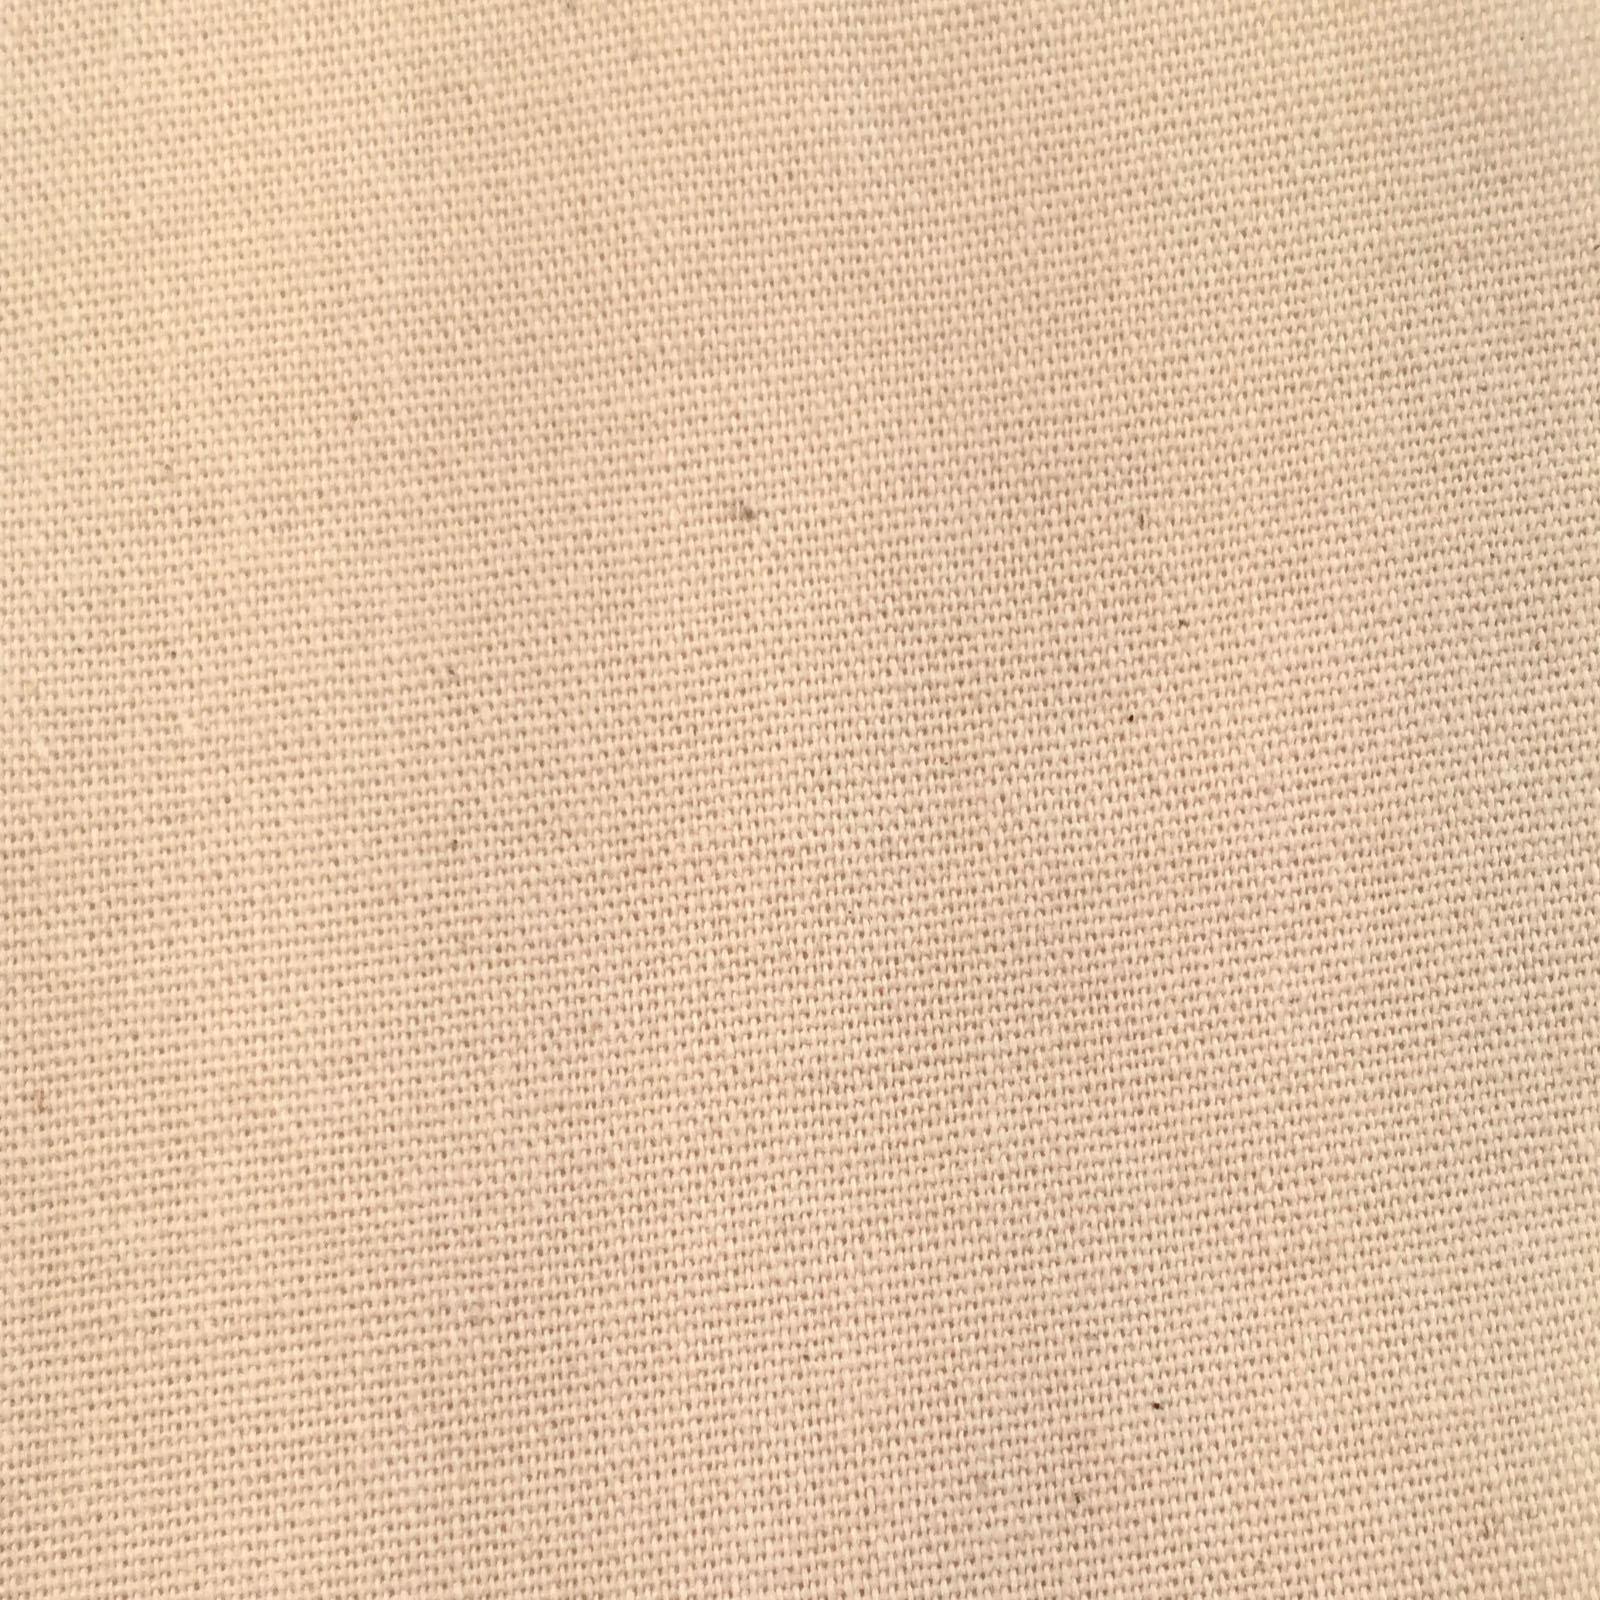 Natural Linen Color